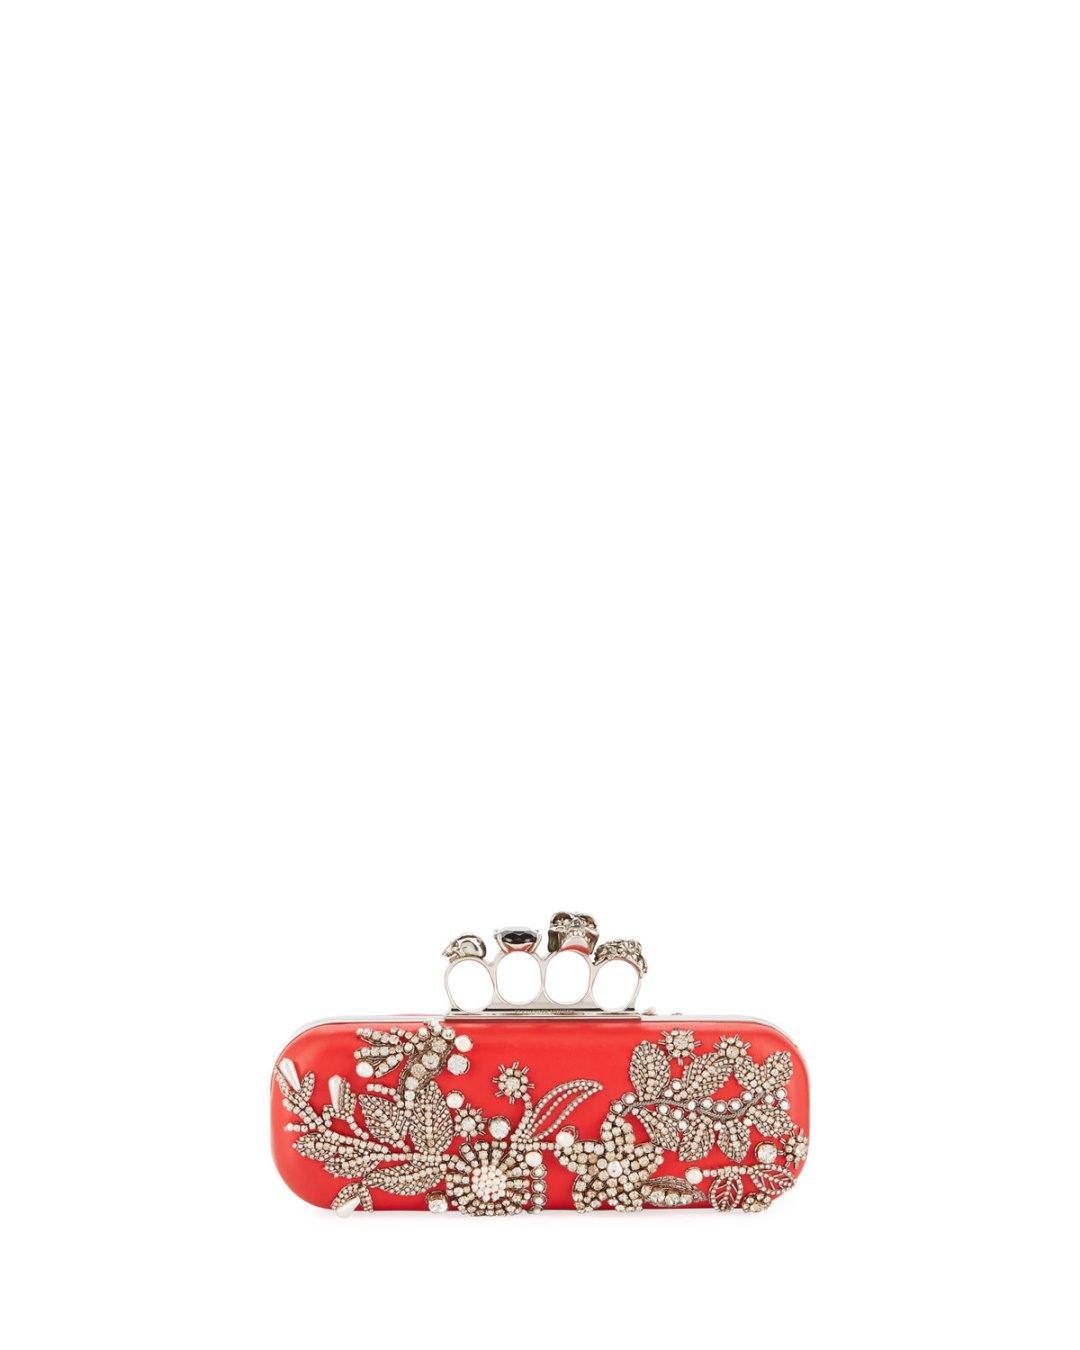 Fashionweek Fashion Week Tendencies Sling Bag Twin Side Pocket Burgundy Maroon Alexander Mcqueen Jeweled Four Ring Hard Clutch Bergdorf Goodman Neiman Marcus 2490